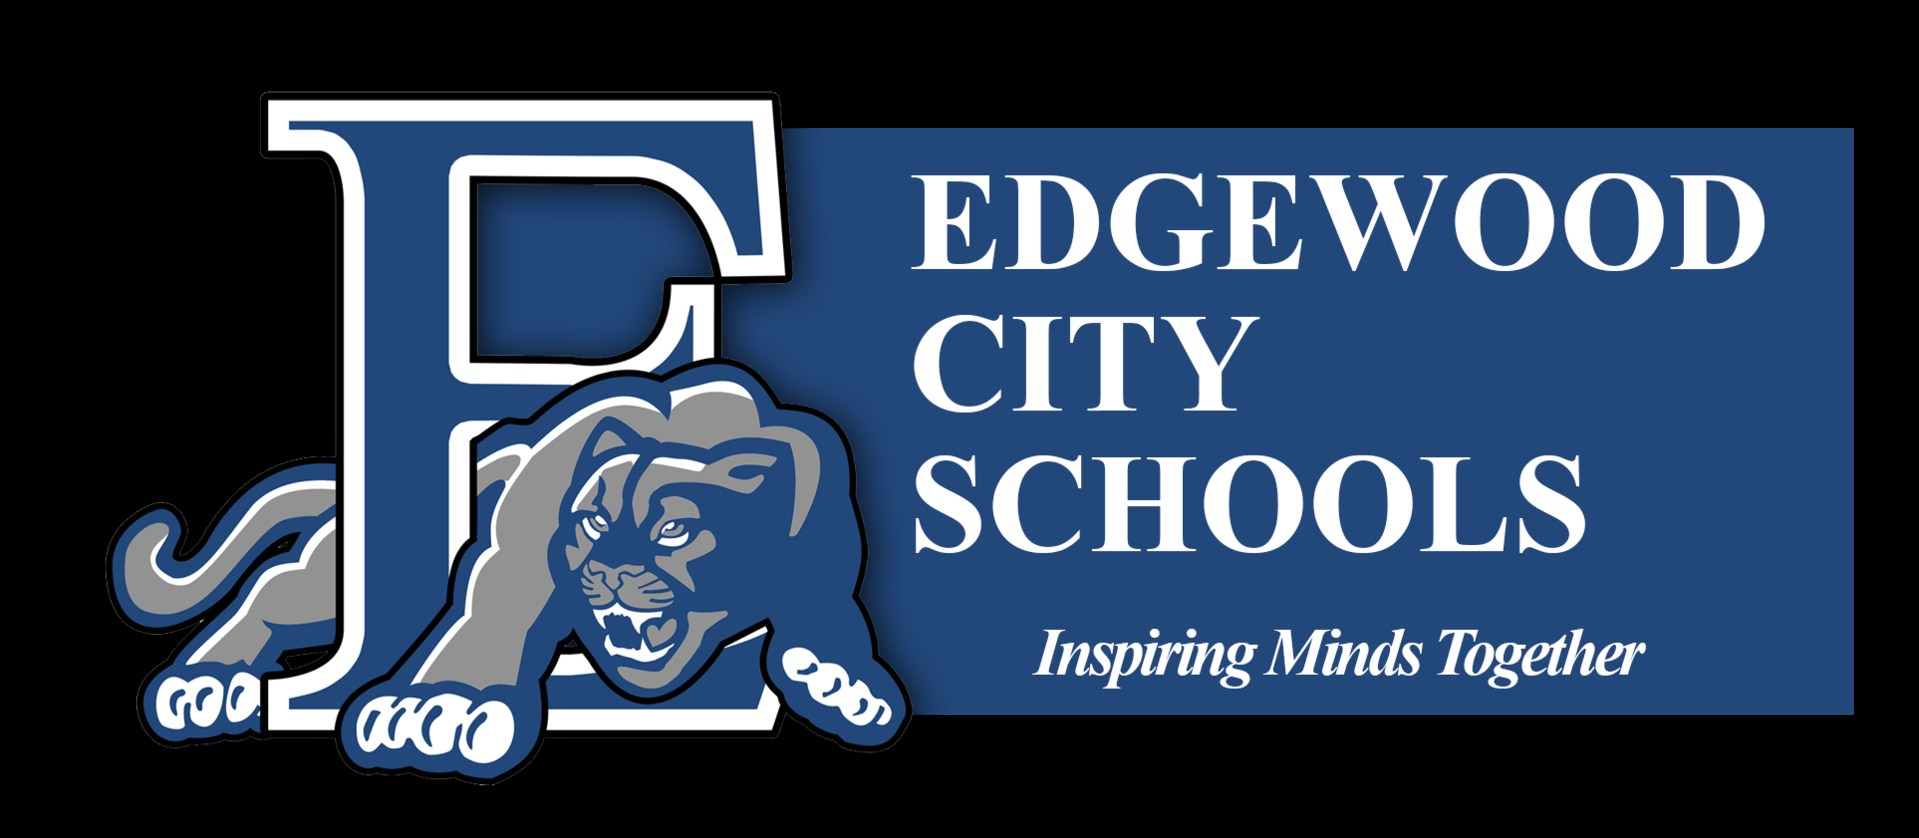 Edgewood Cougar logo